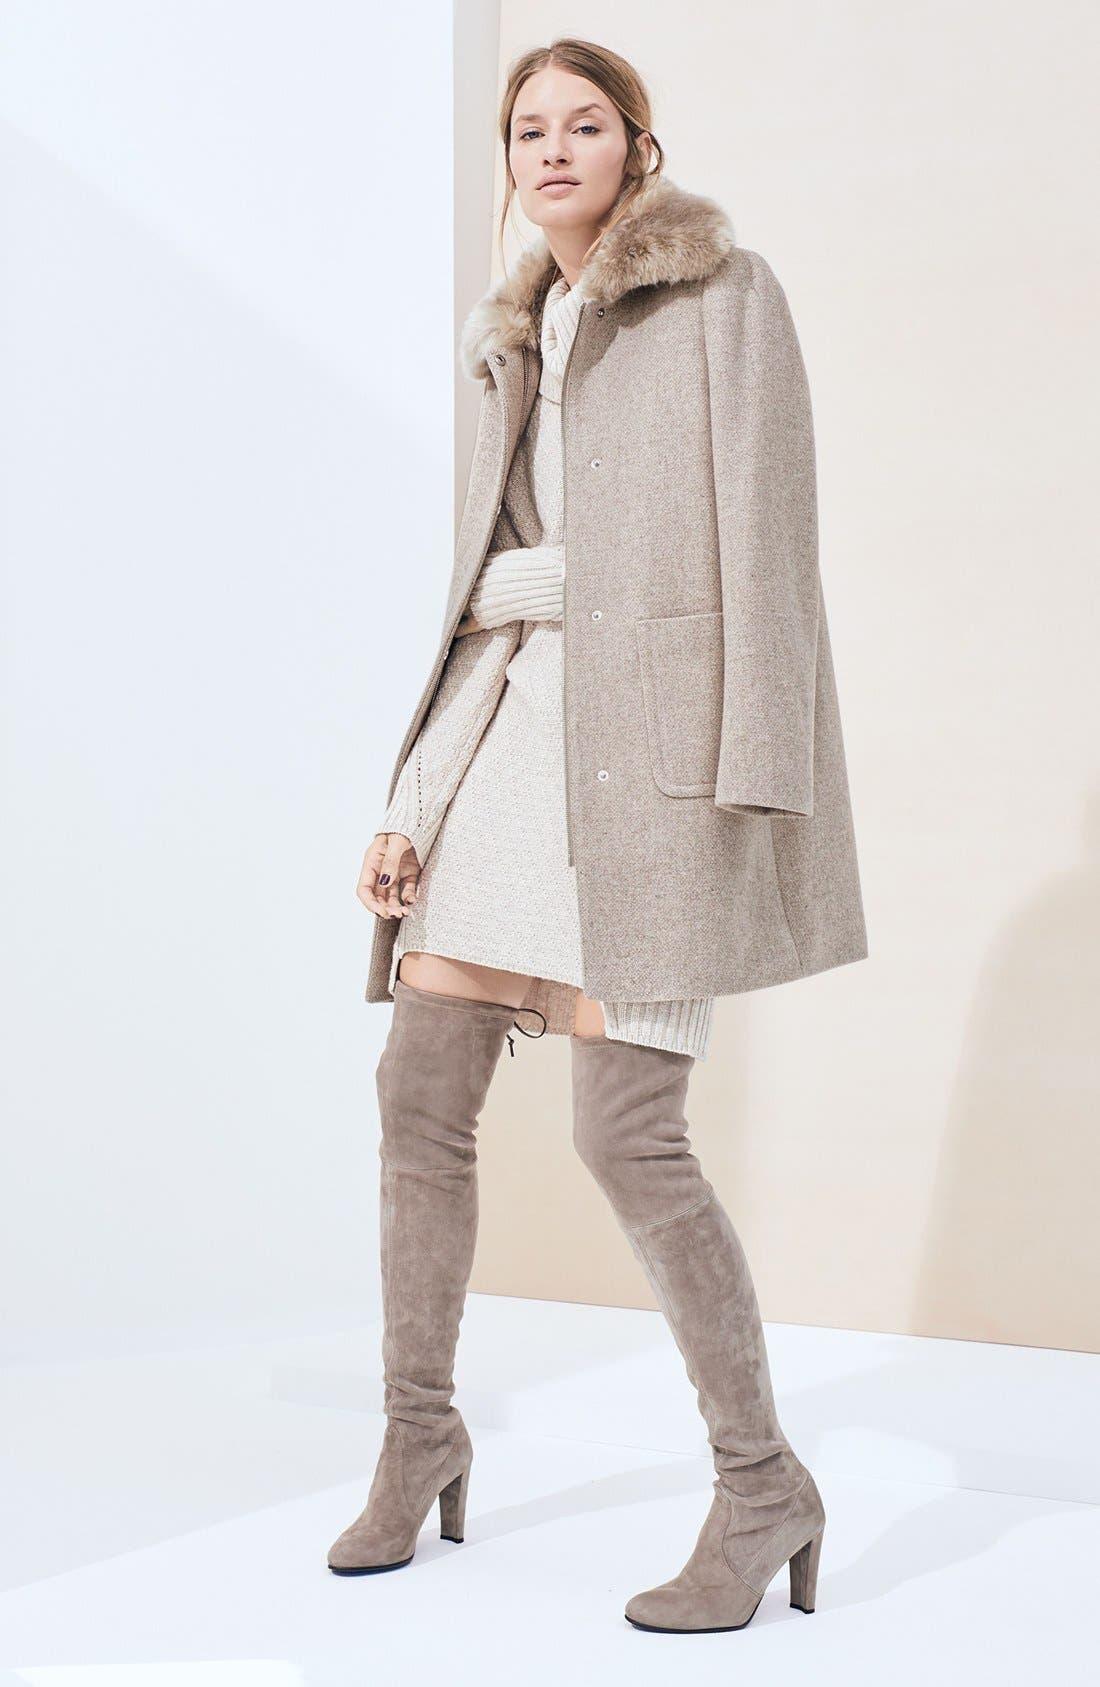 LAUREN RALPH LAUREN,                             Wool Blend Coat with Faux Fur Collar,                             Alternate thumbnail 2, color,                             068